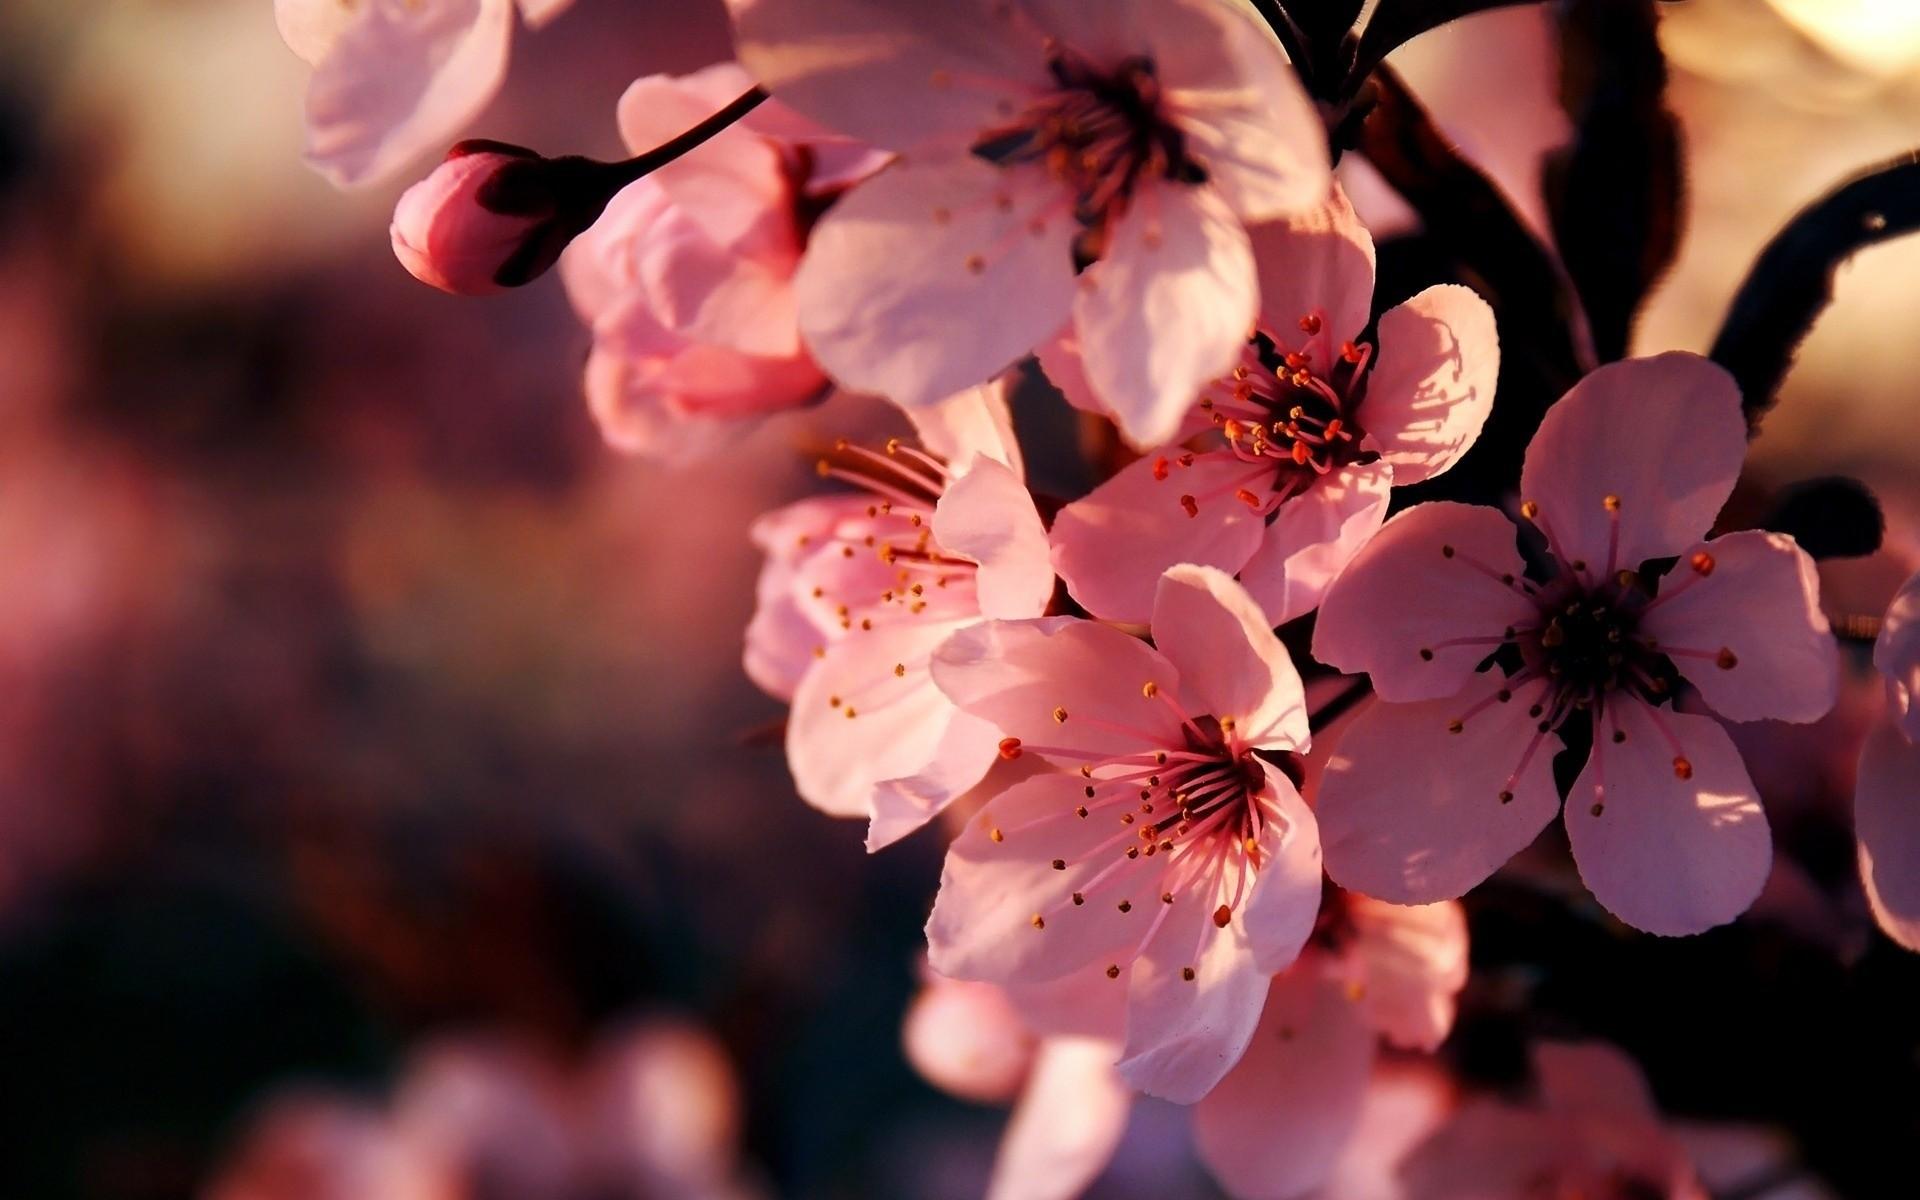 Обои Япония, шоссе, Shin mimura, цветущая вишня. Города foto 15